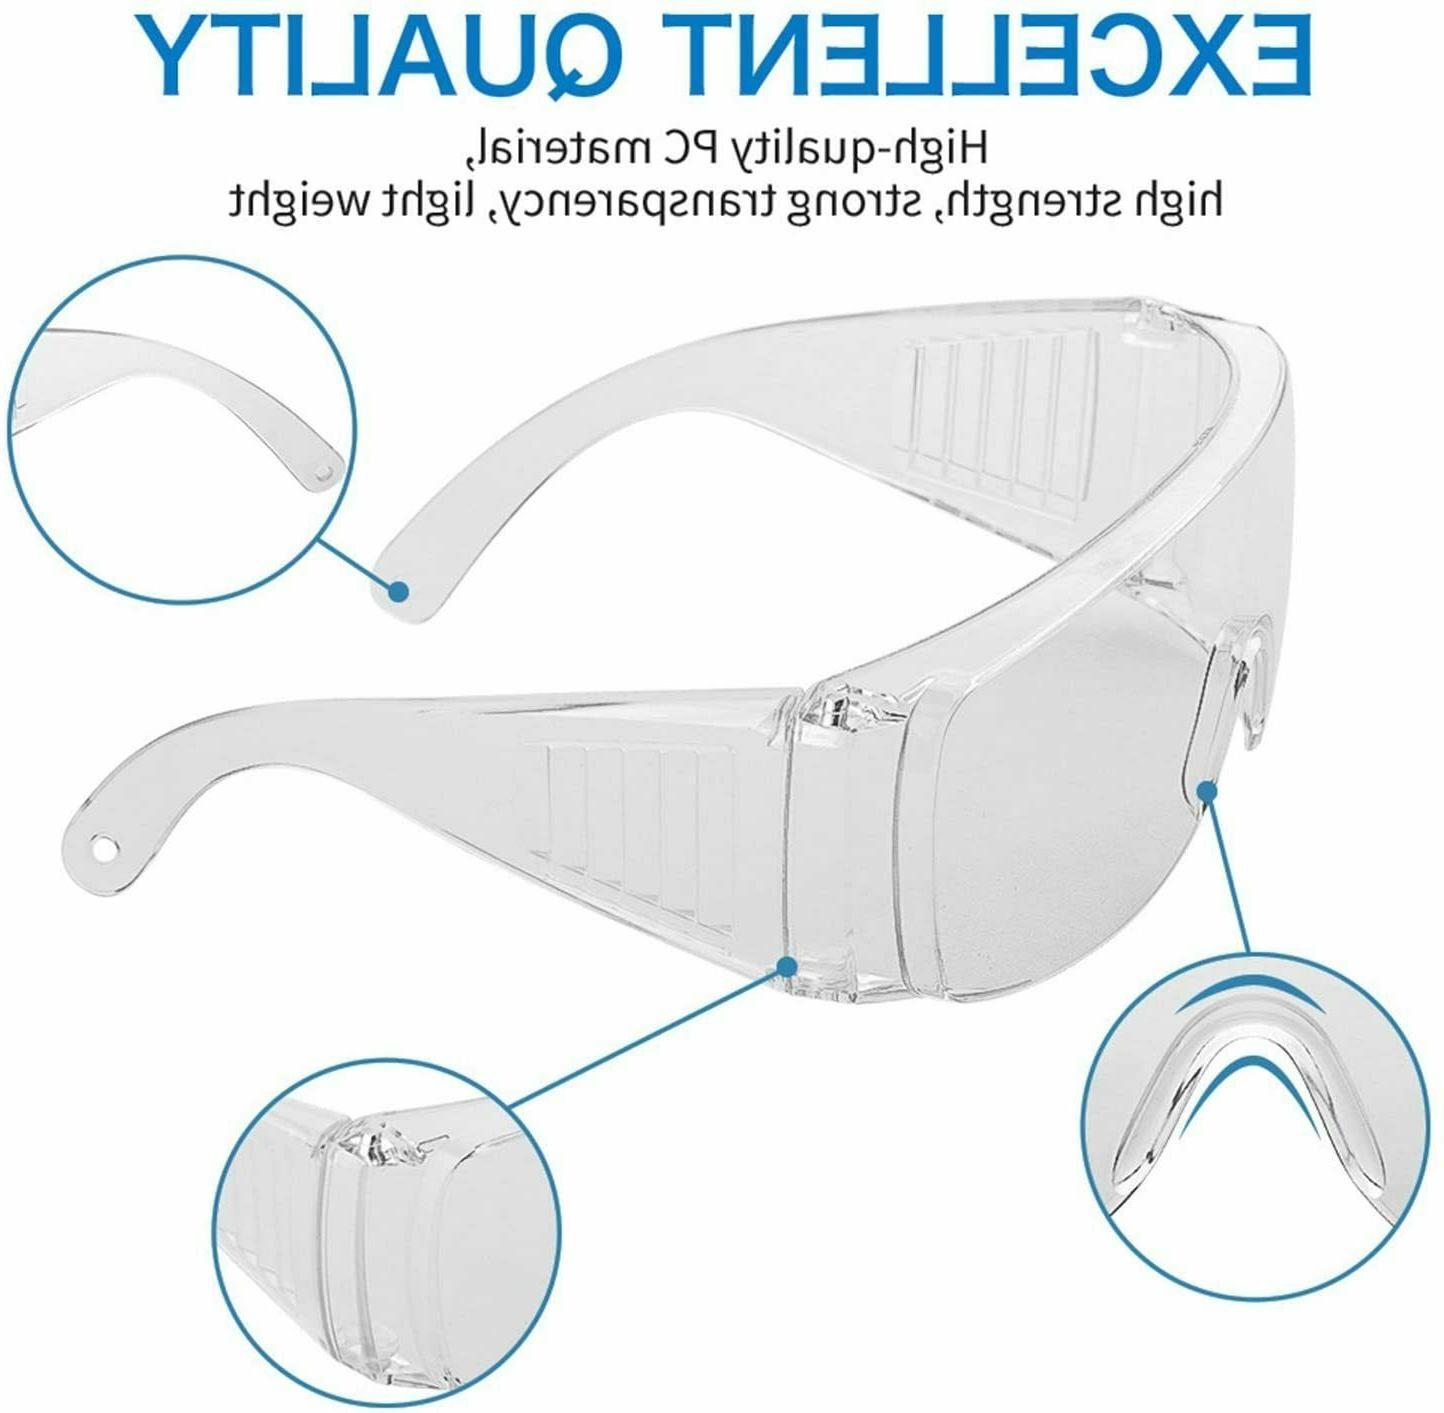 Safety Glasses, Anti-frog Protective Eyewear,